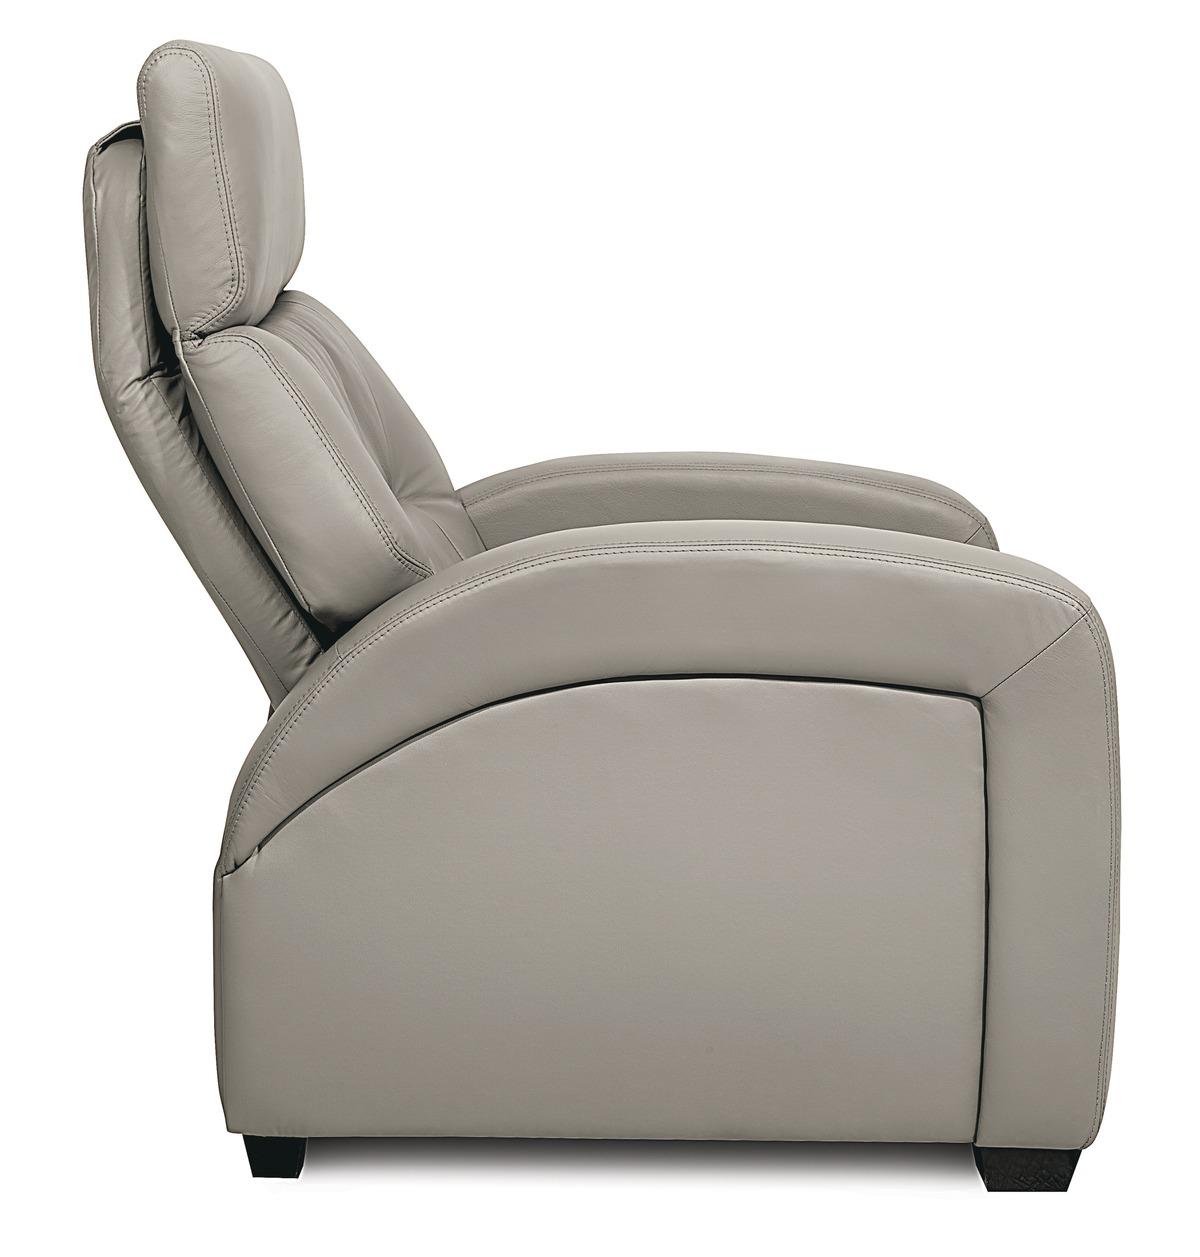 Incredible Zg5 Zero Gravity Recliner 350 Fabrics And Sofas And Machost Co Dining Chair Design Ideas Machostcouk